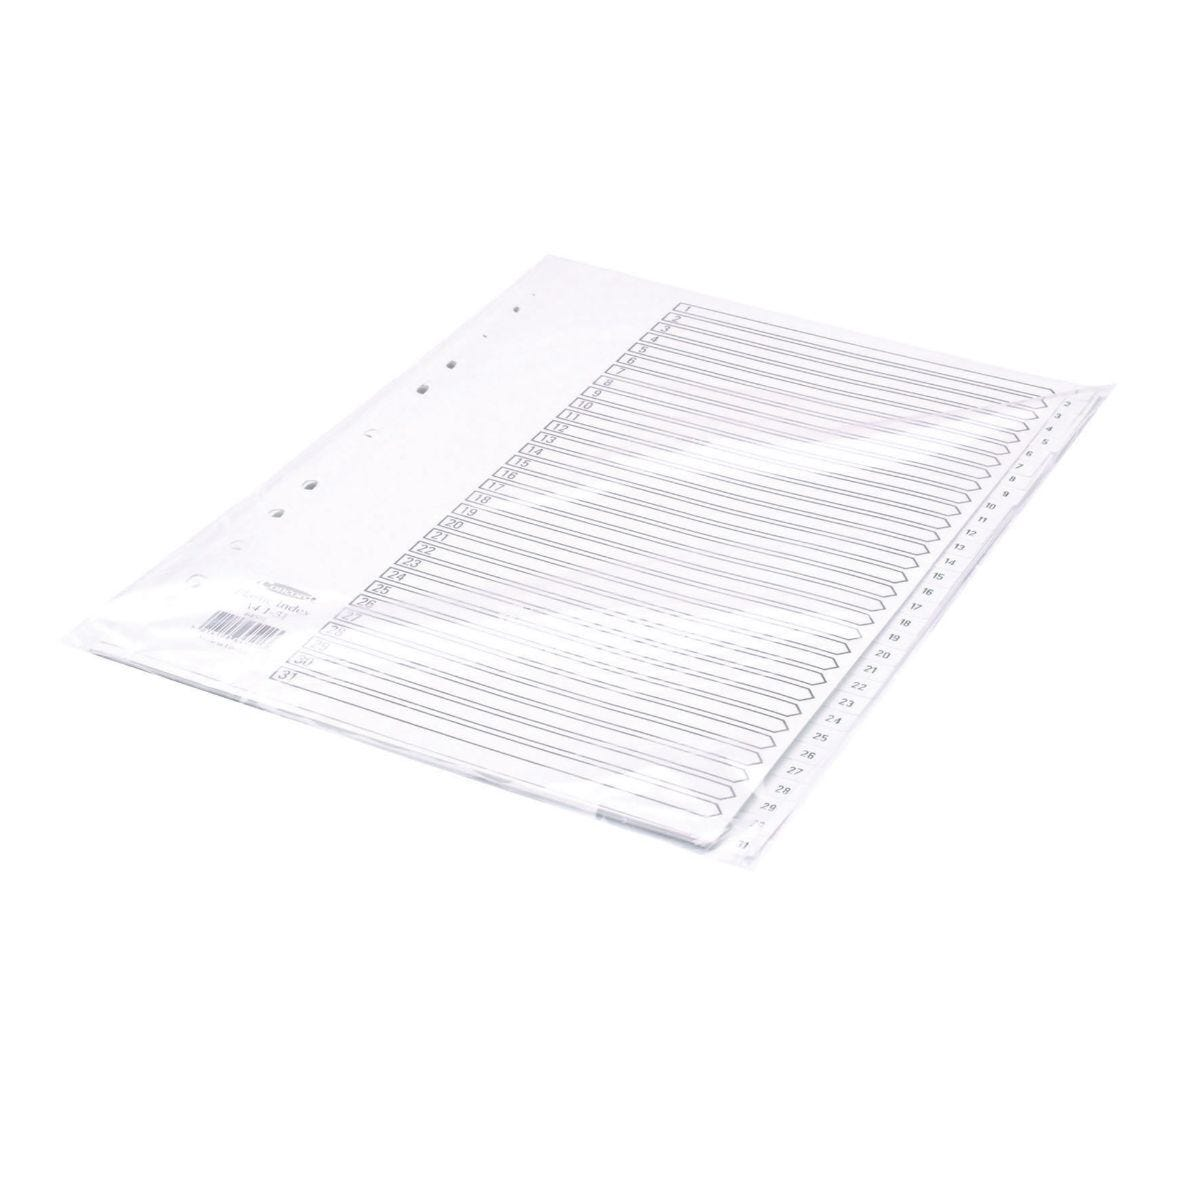 Concord Polypropylene Index 1-31 A4 White